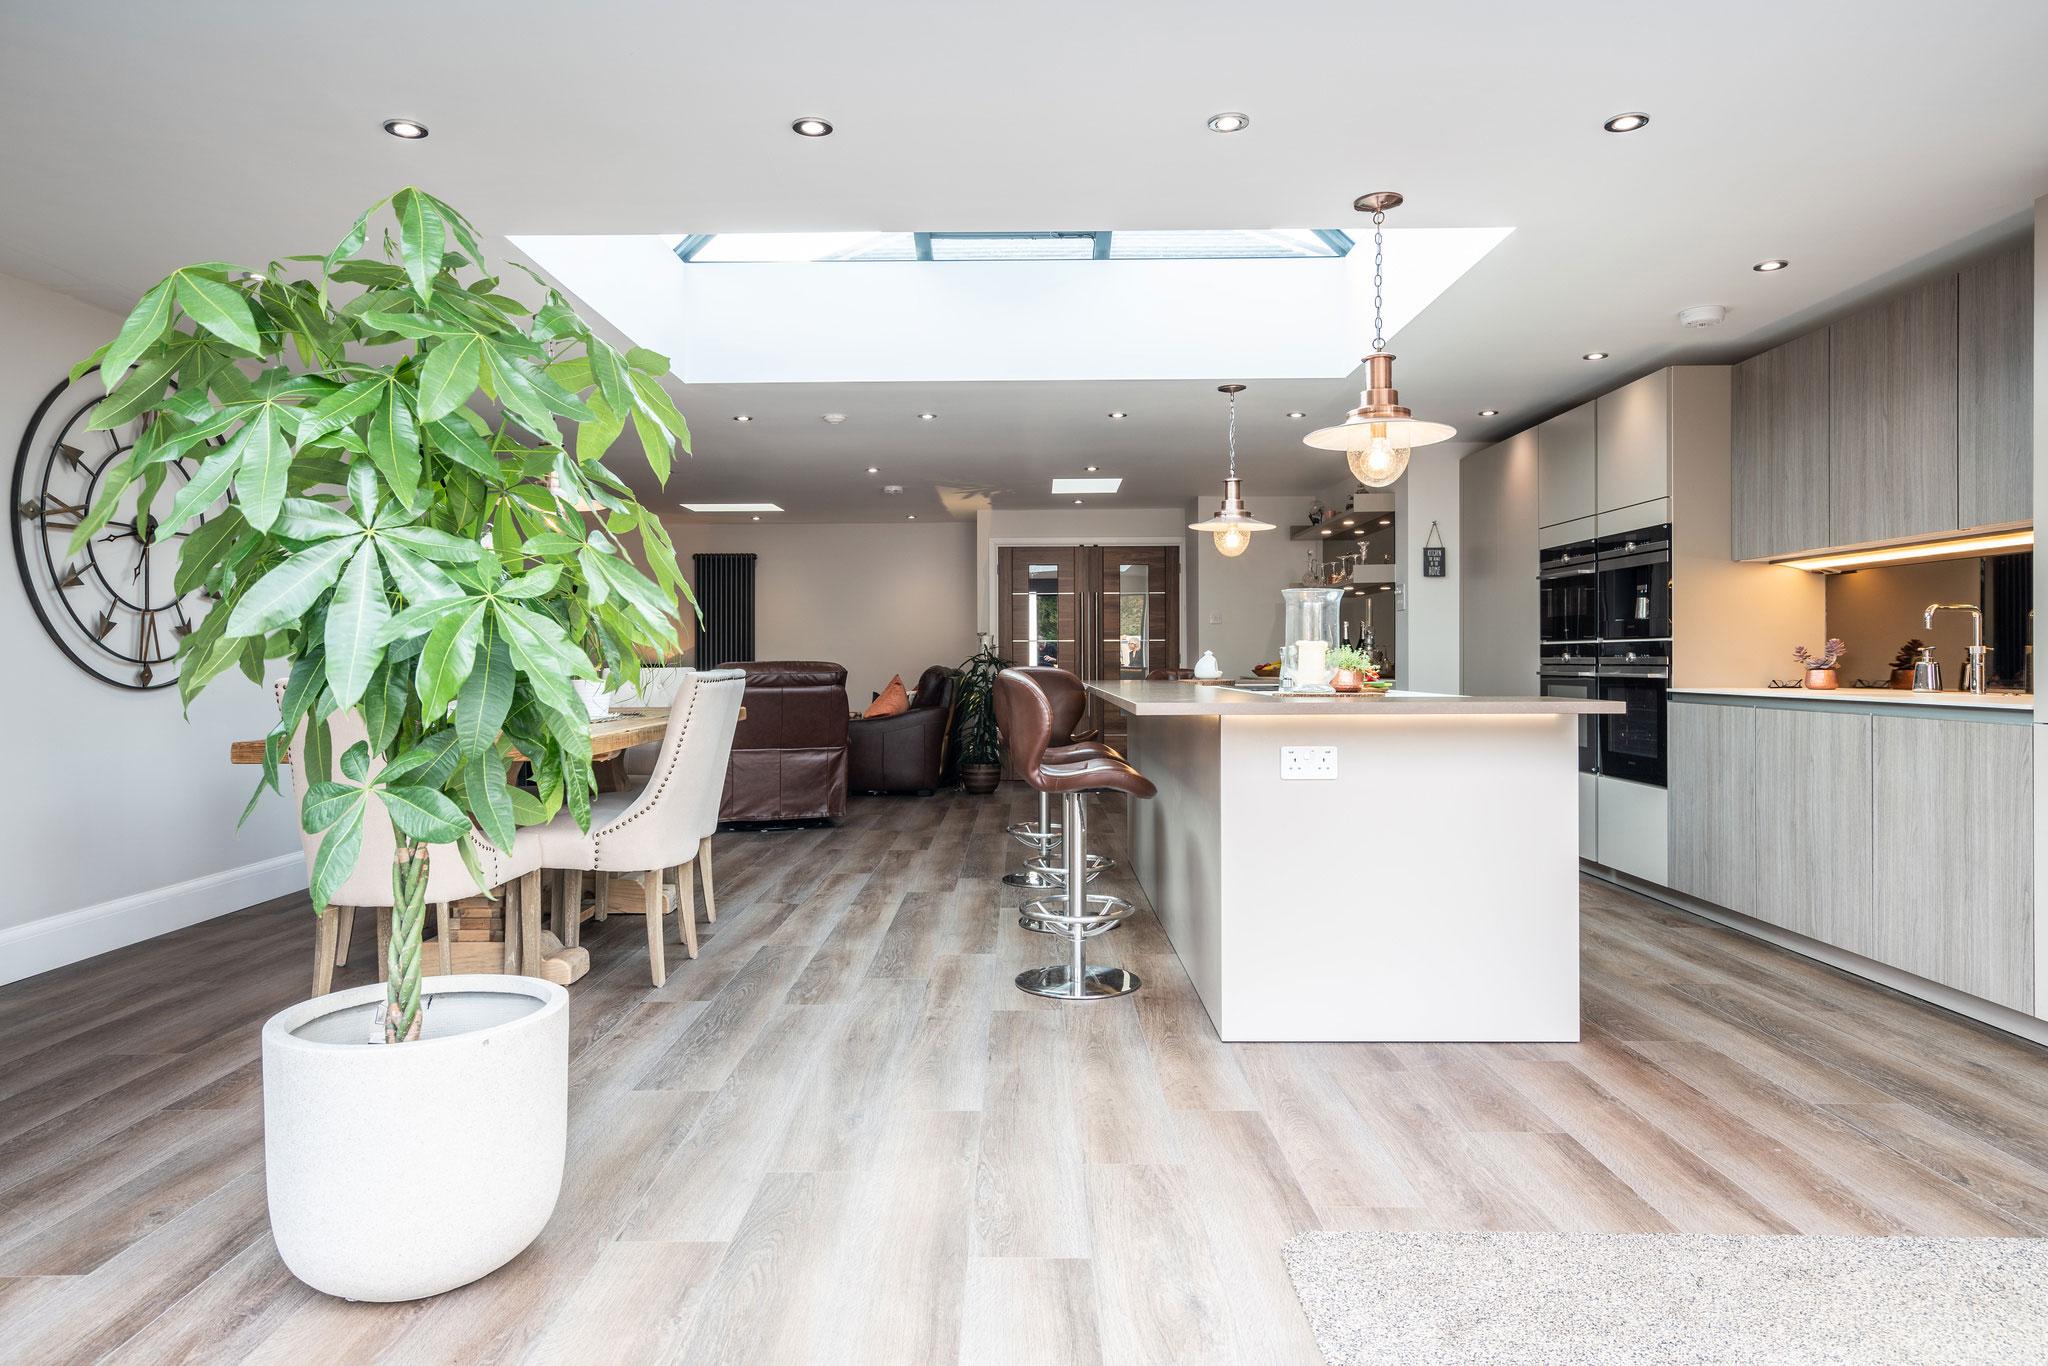 Image of Myers Touch Daniels Kitchen 01224 ZF 2442 14358 1 069 in Een ruimte ontworpen om te socializen - Cosentino